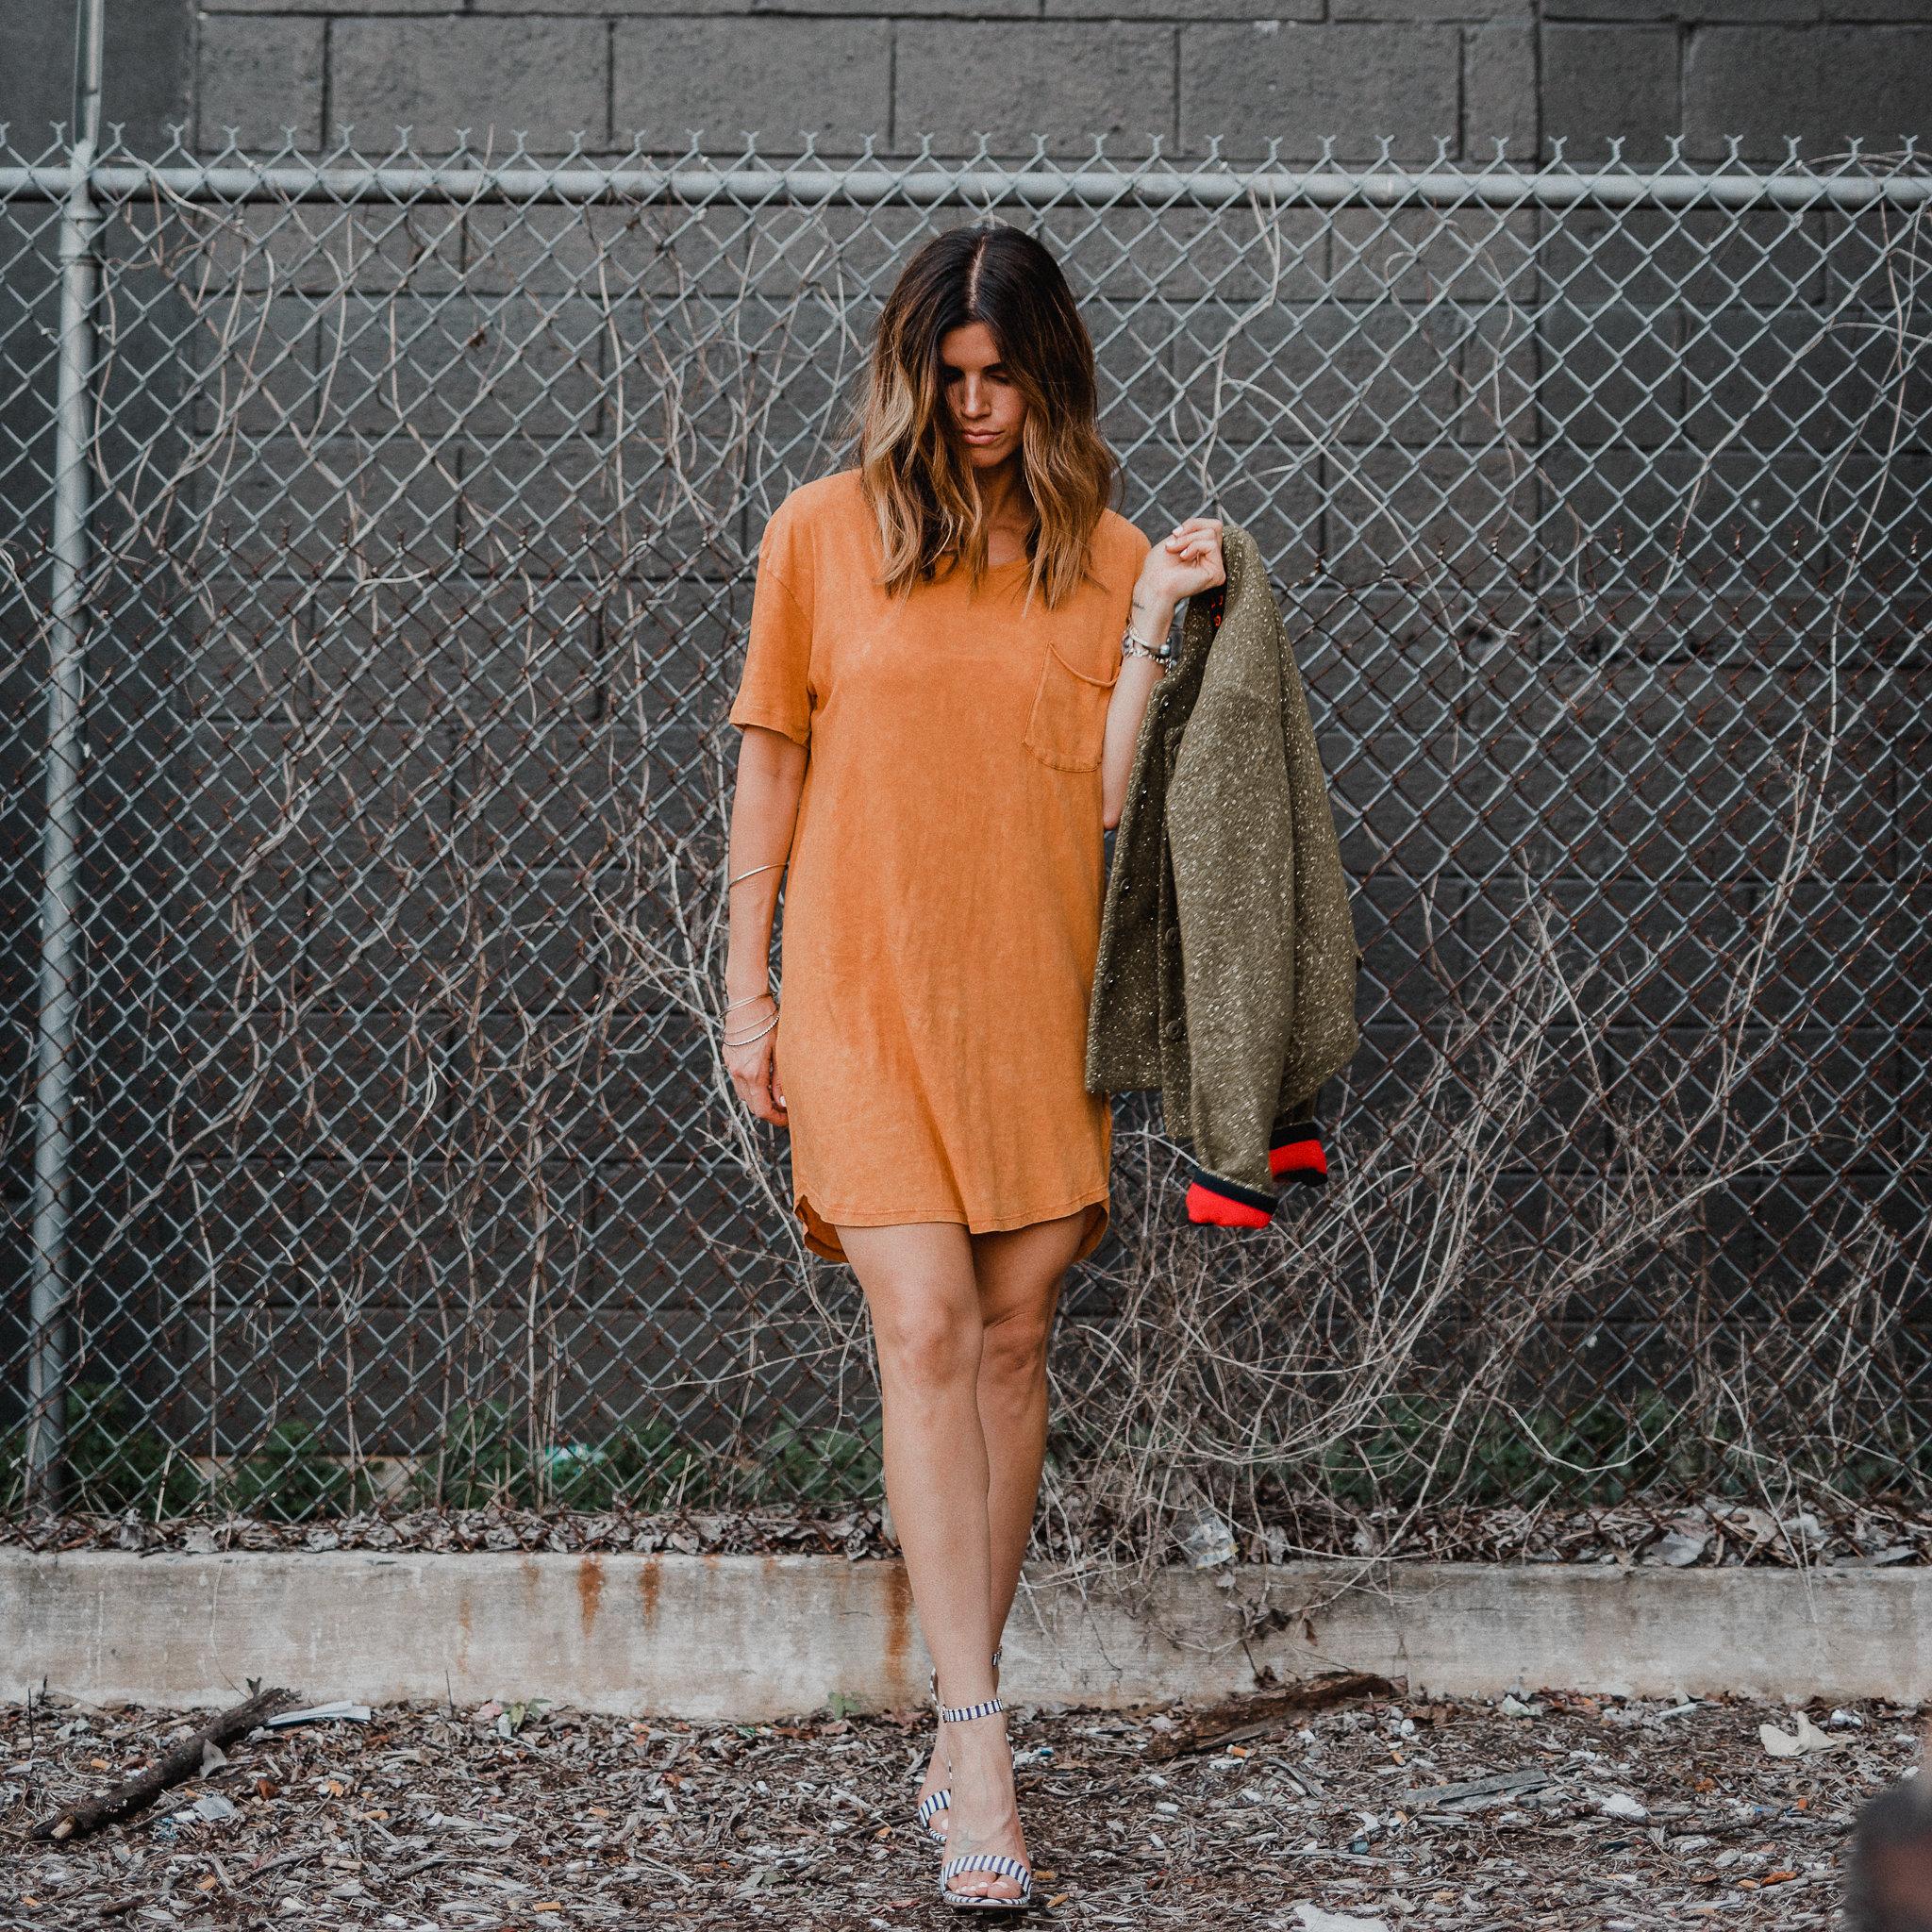 street-style_dress-outfit-ideas.jpg